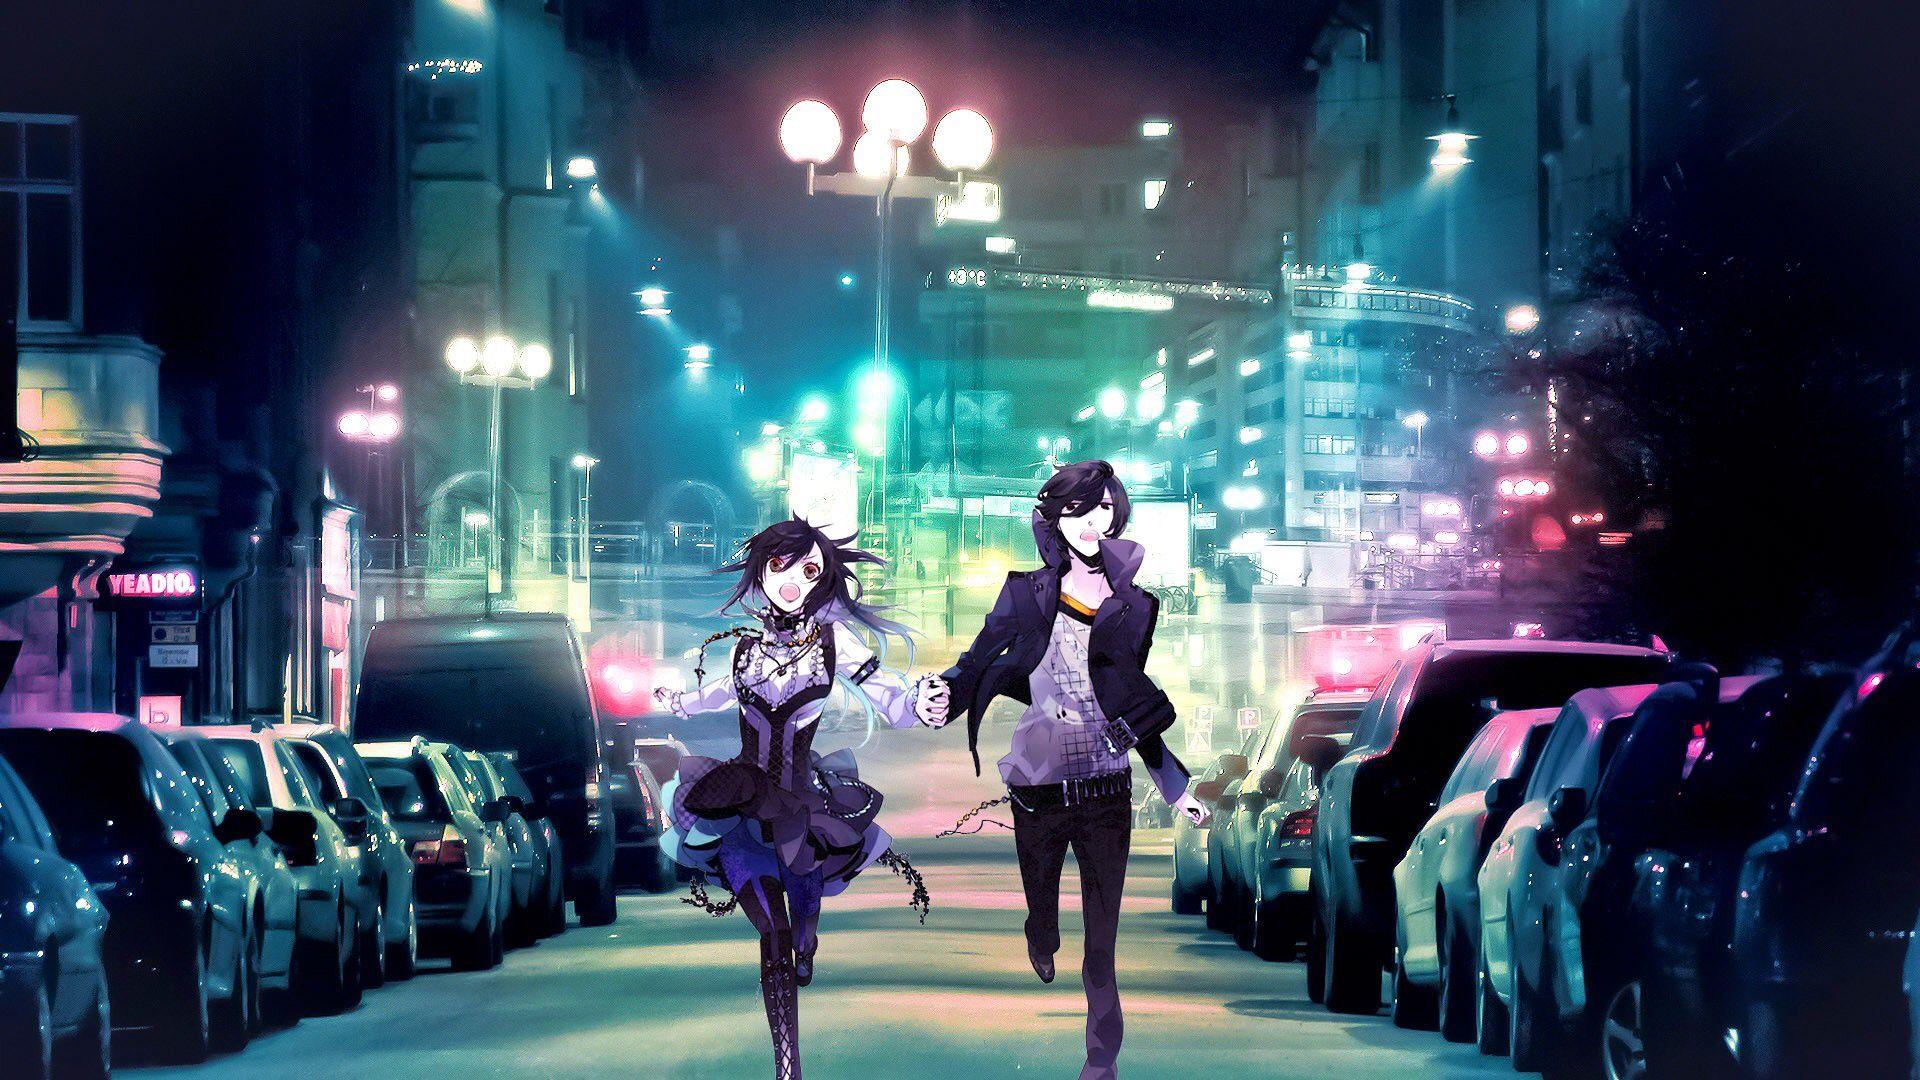 Anime Couple Anime City Anime Wallpaper Hd Anime Wallpapers 14 wallpaper anime city